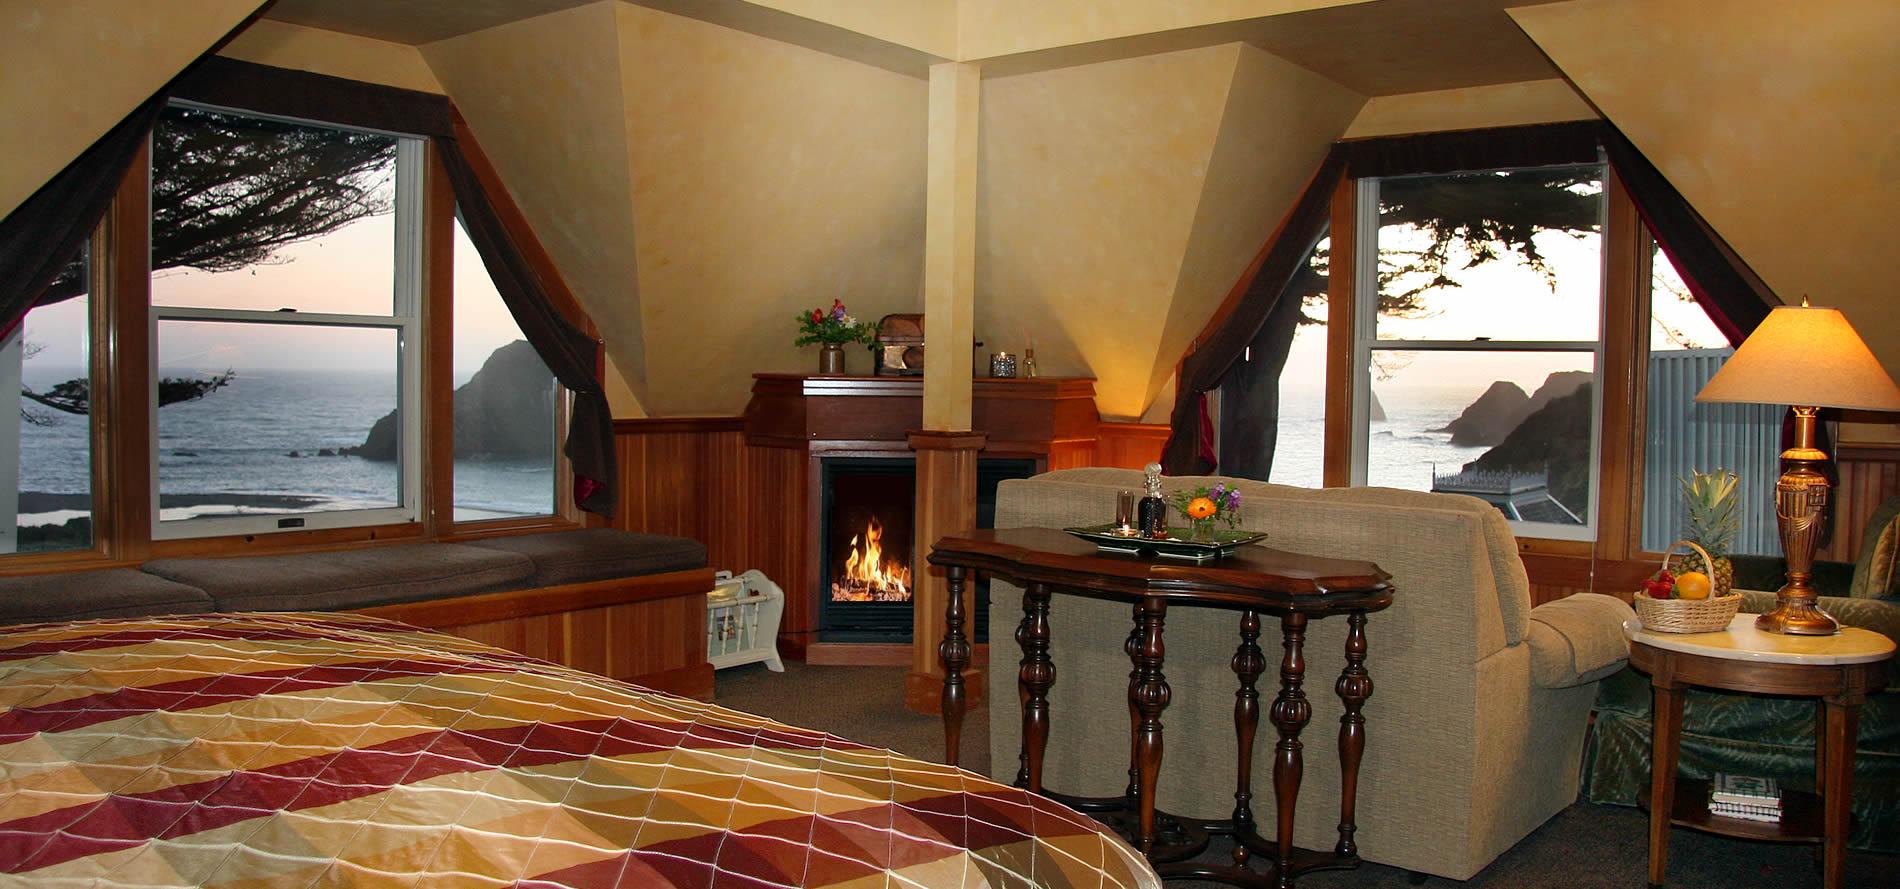 seascape room at elk cove inn with ocean view